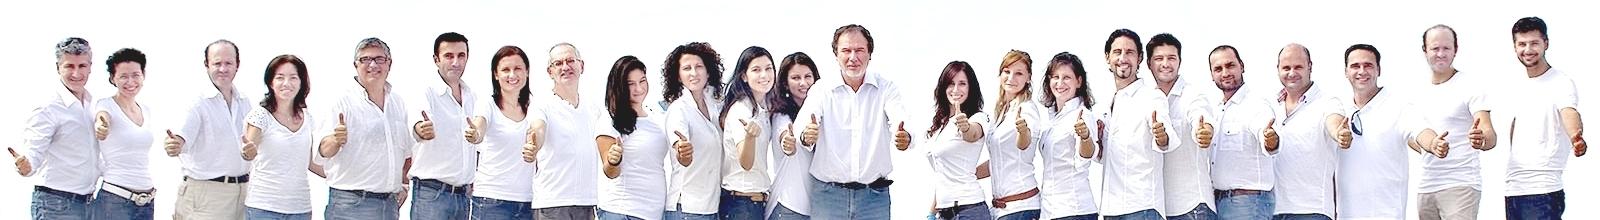 Team-Topoprogram_white_x